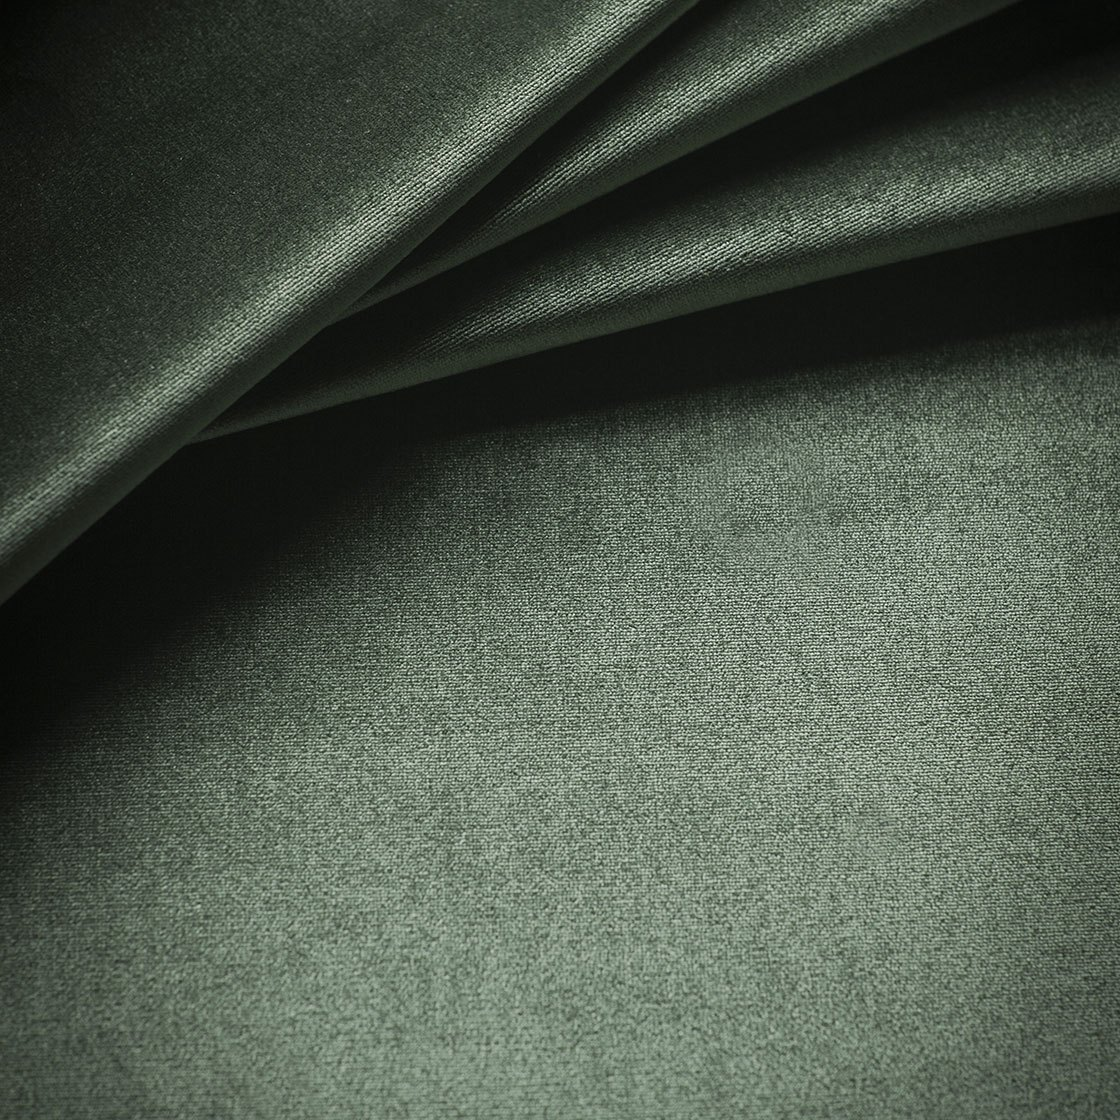 Capri Silk Velvet - Mistleotoe - Beaumont & Fletcher - Beaumont & Fletcher